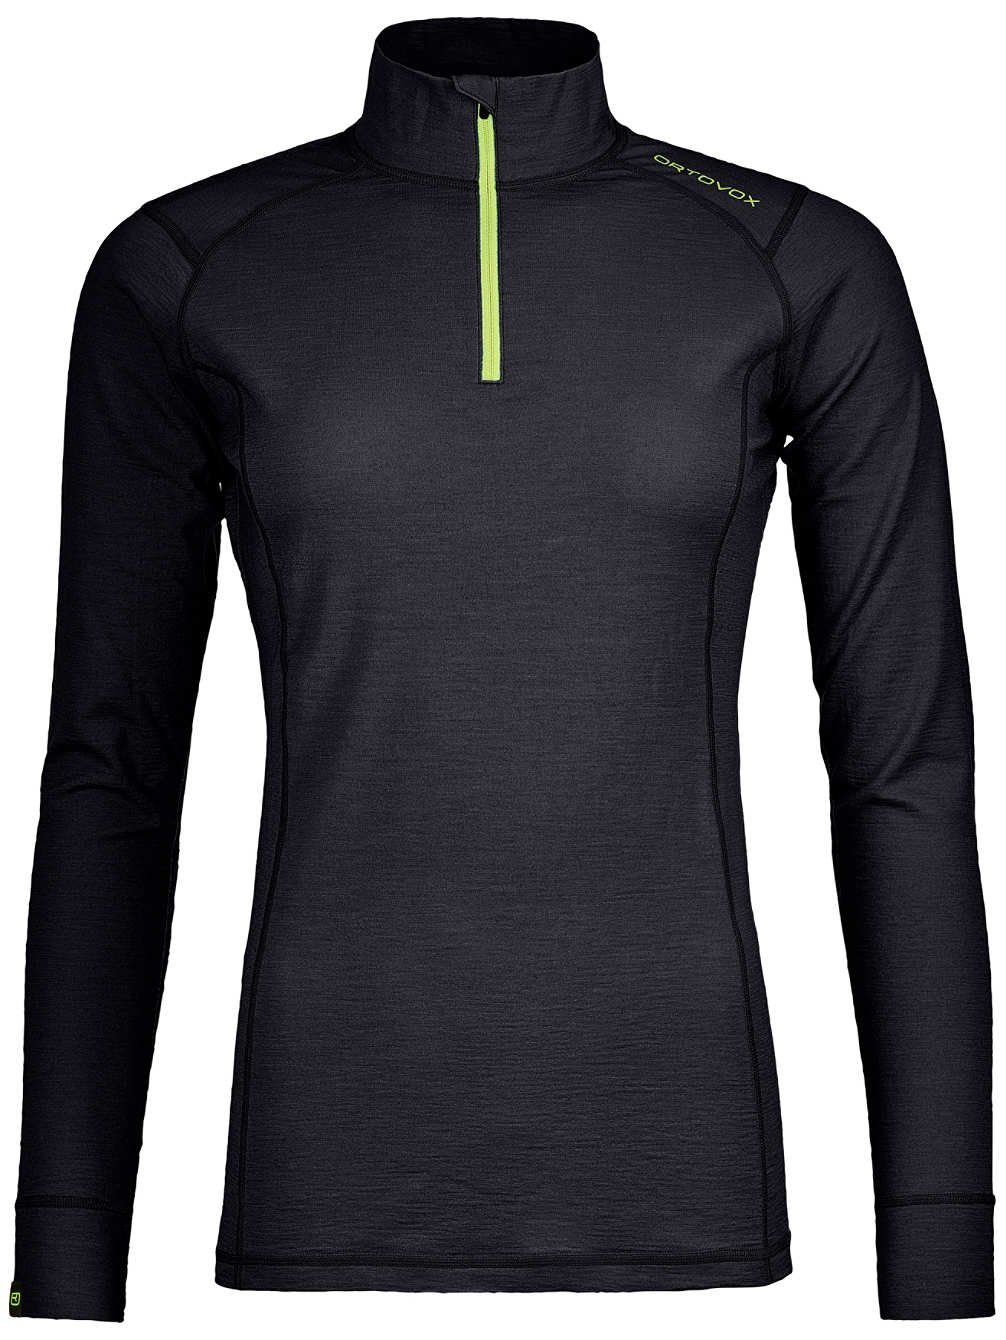 Ortovox Damen 145 Ultra Zip Neck Shirt ORTO5|#Ortovox